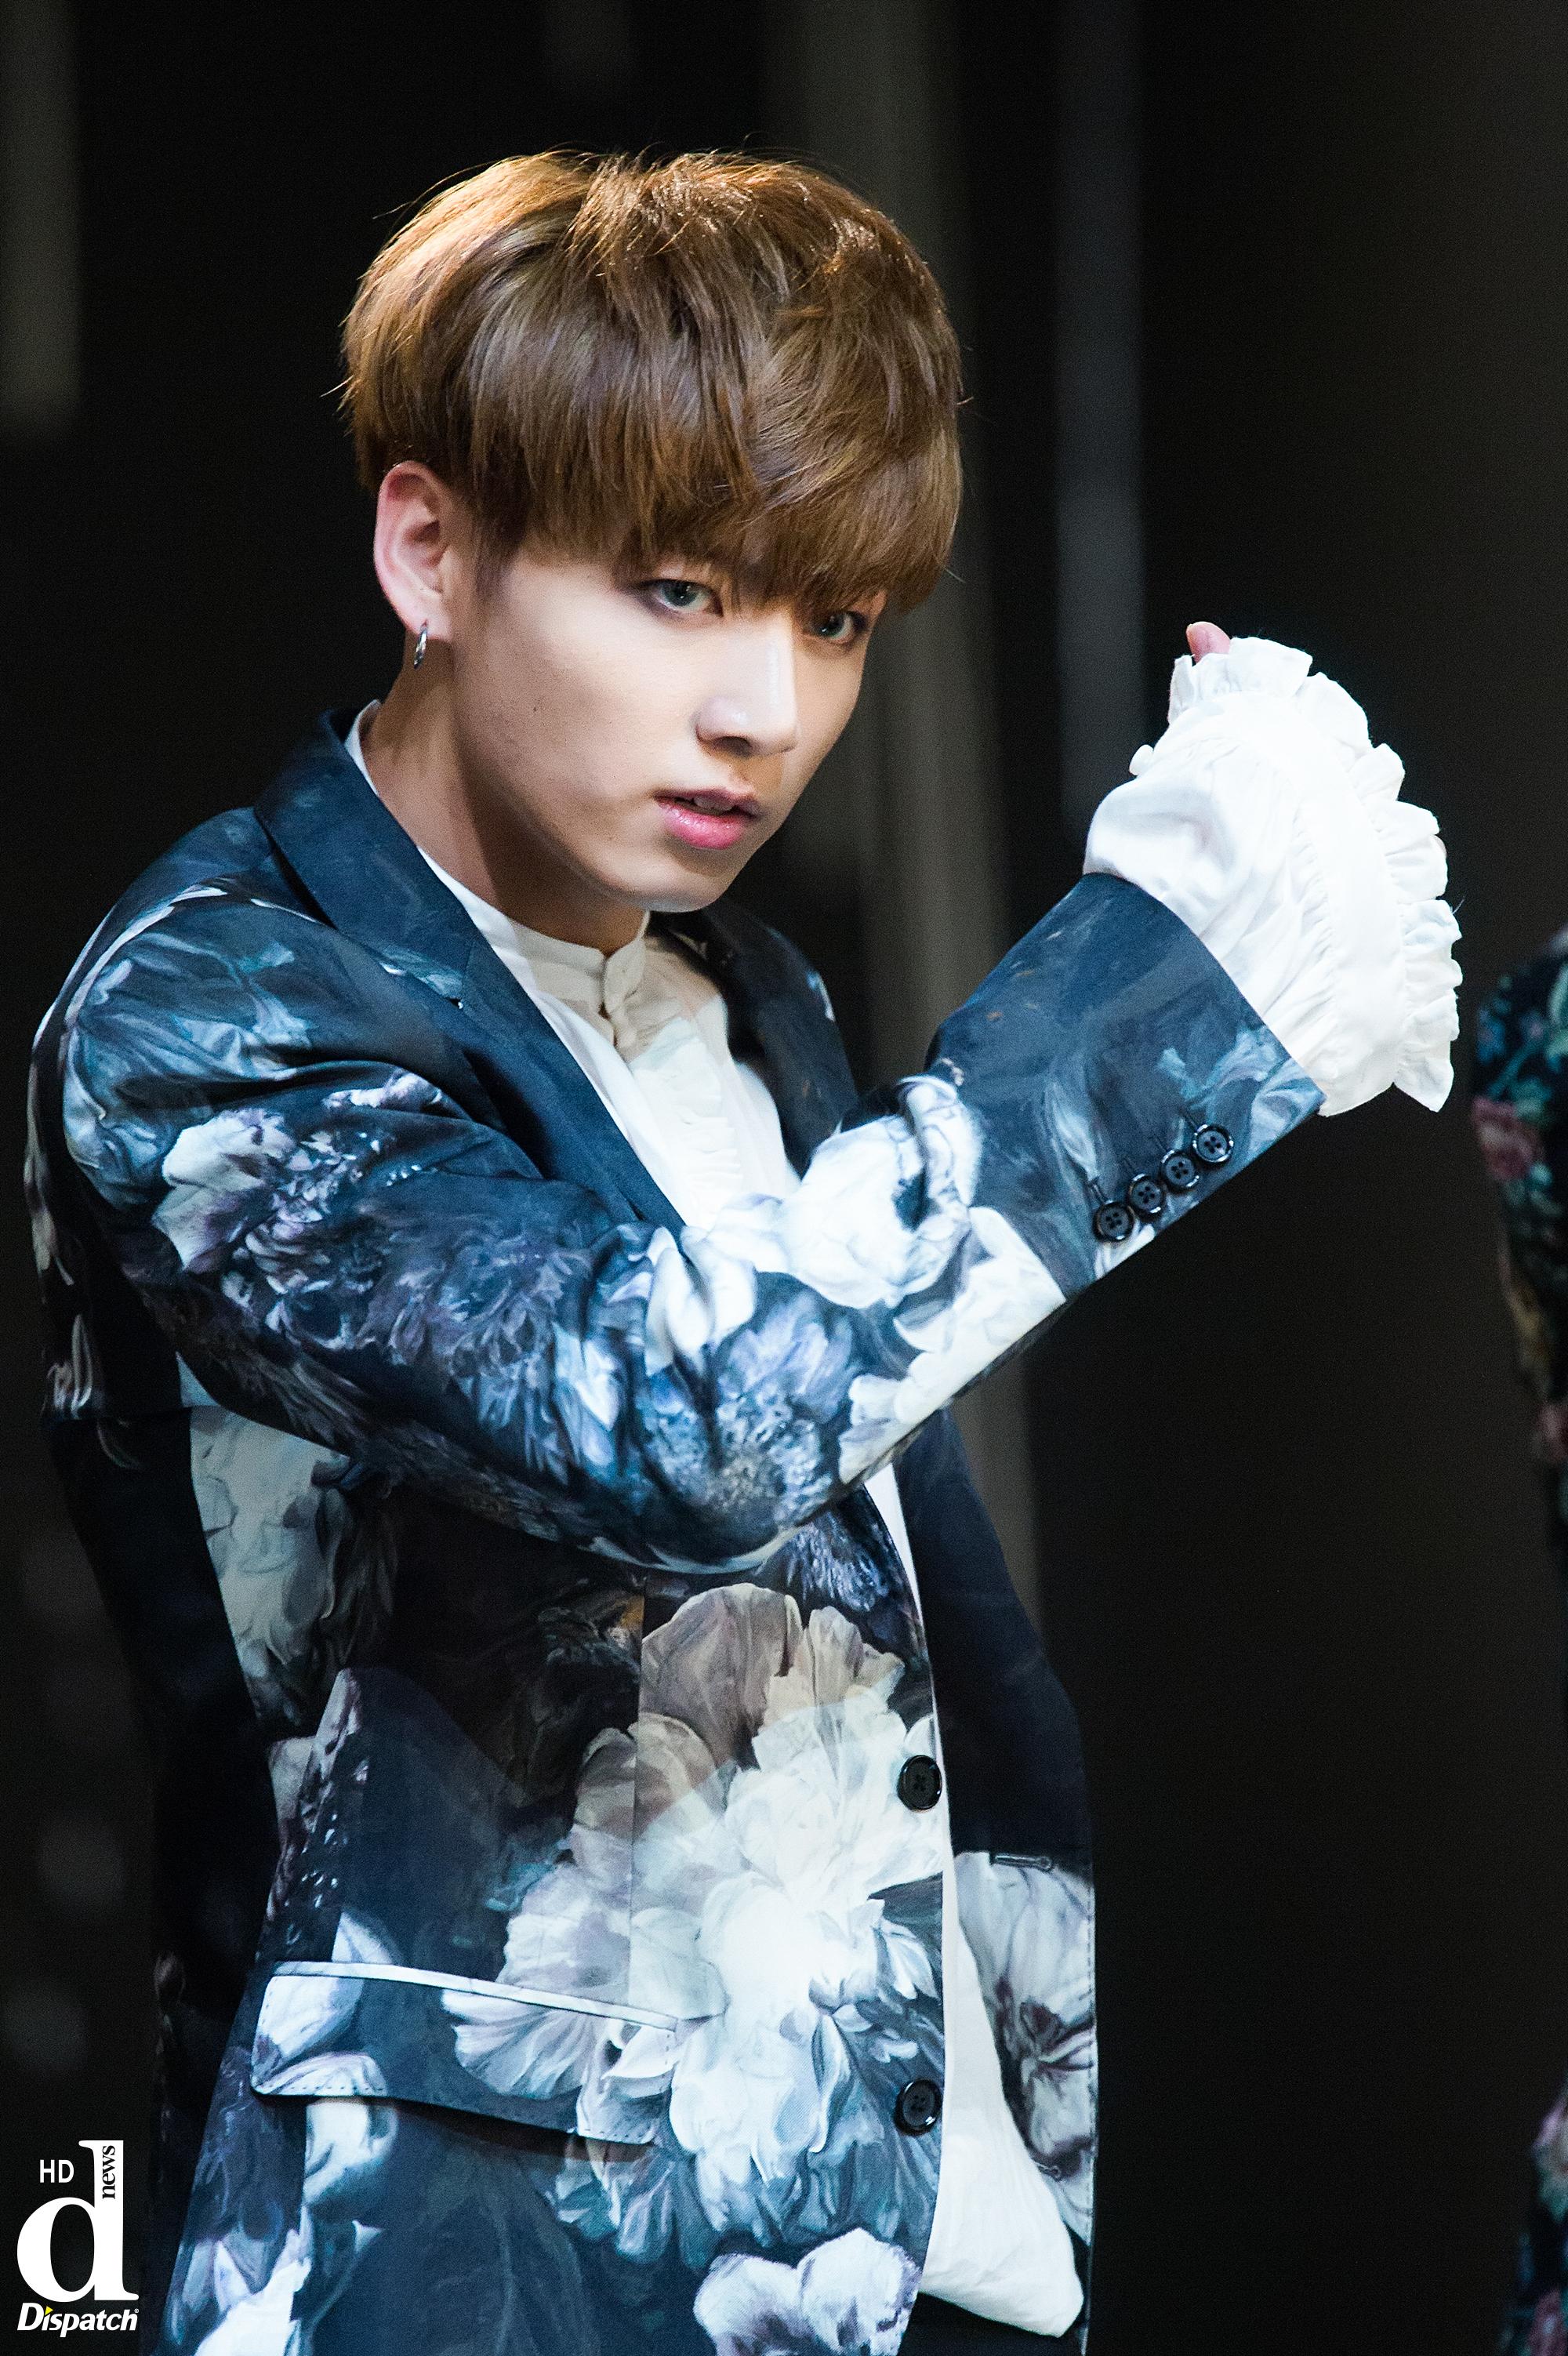 korea korean kpop idol boy band group BTS blood, sweat